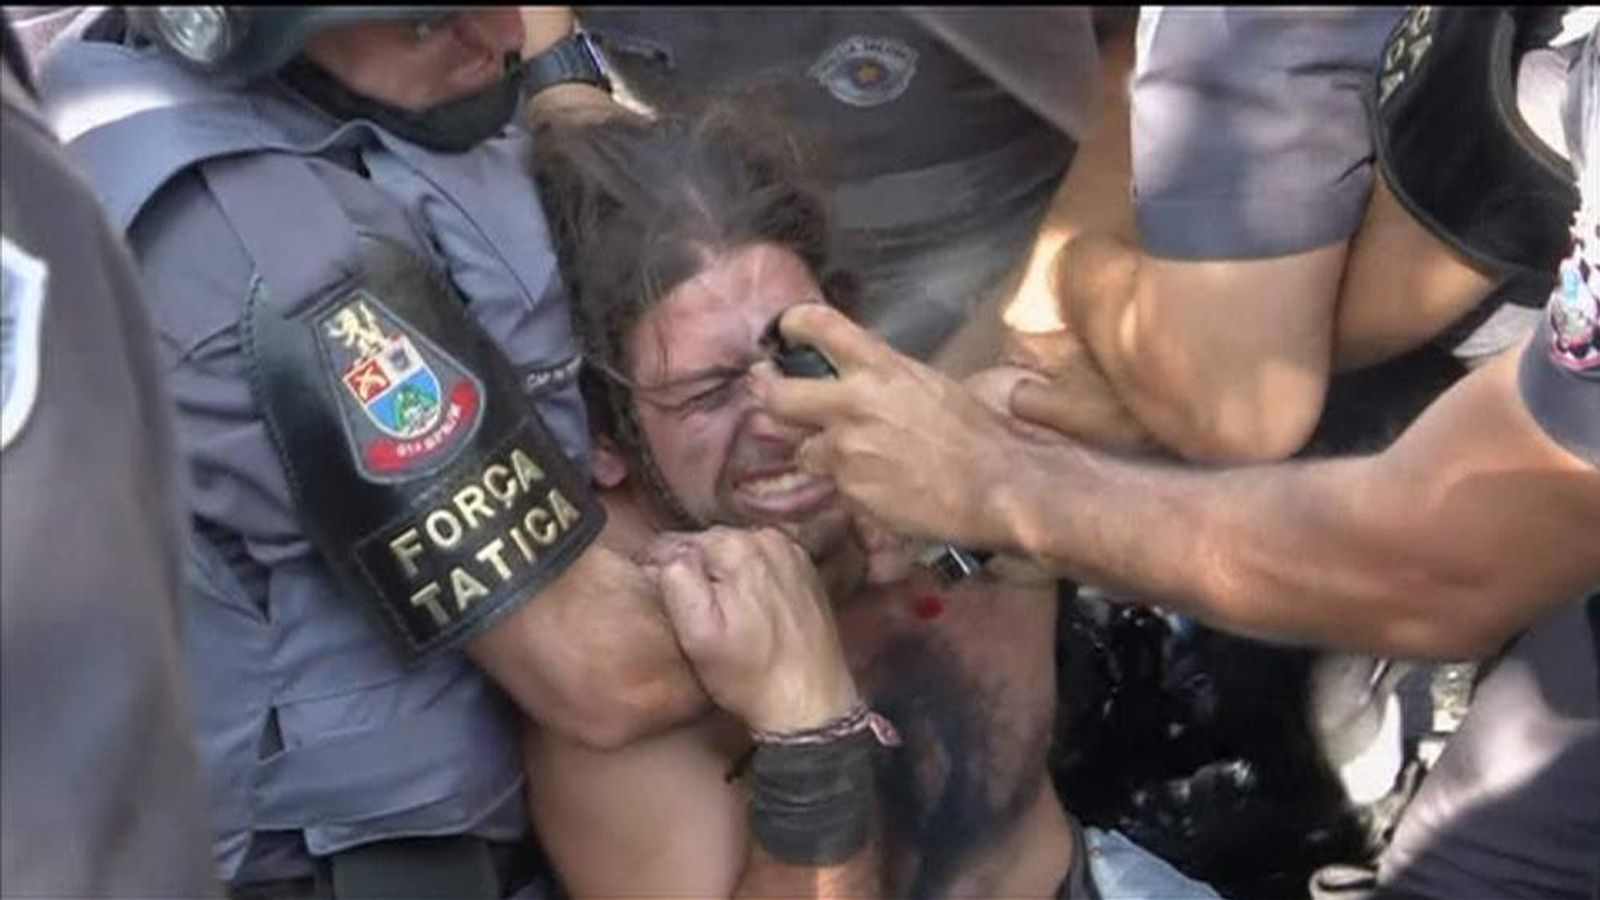 Brazilian police restrain a Sao Paulo protester before pepper spraying him